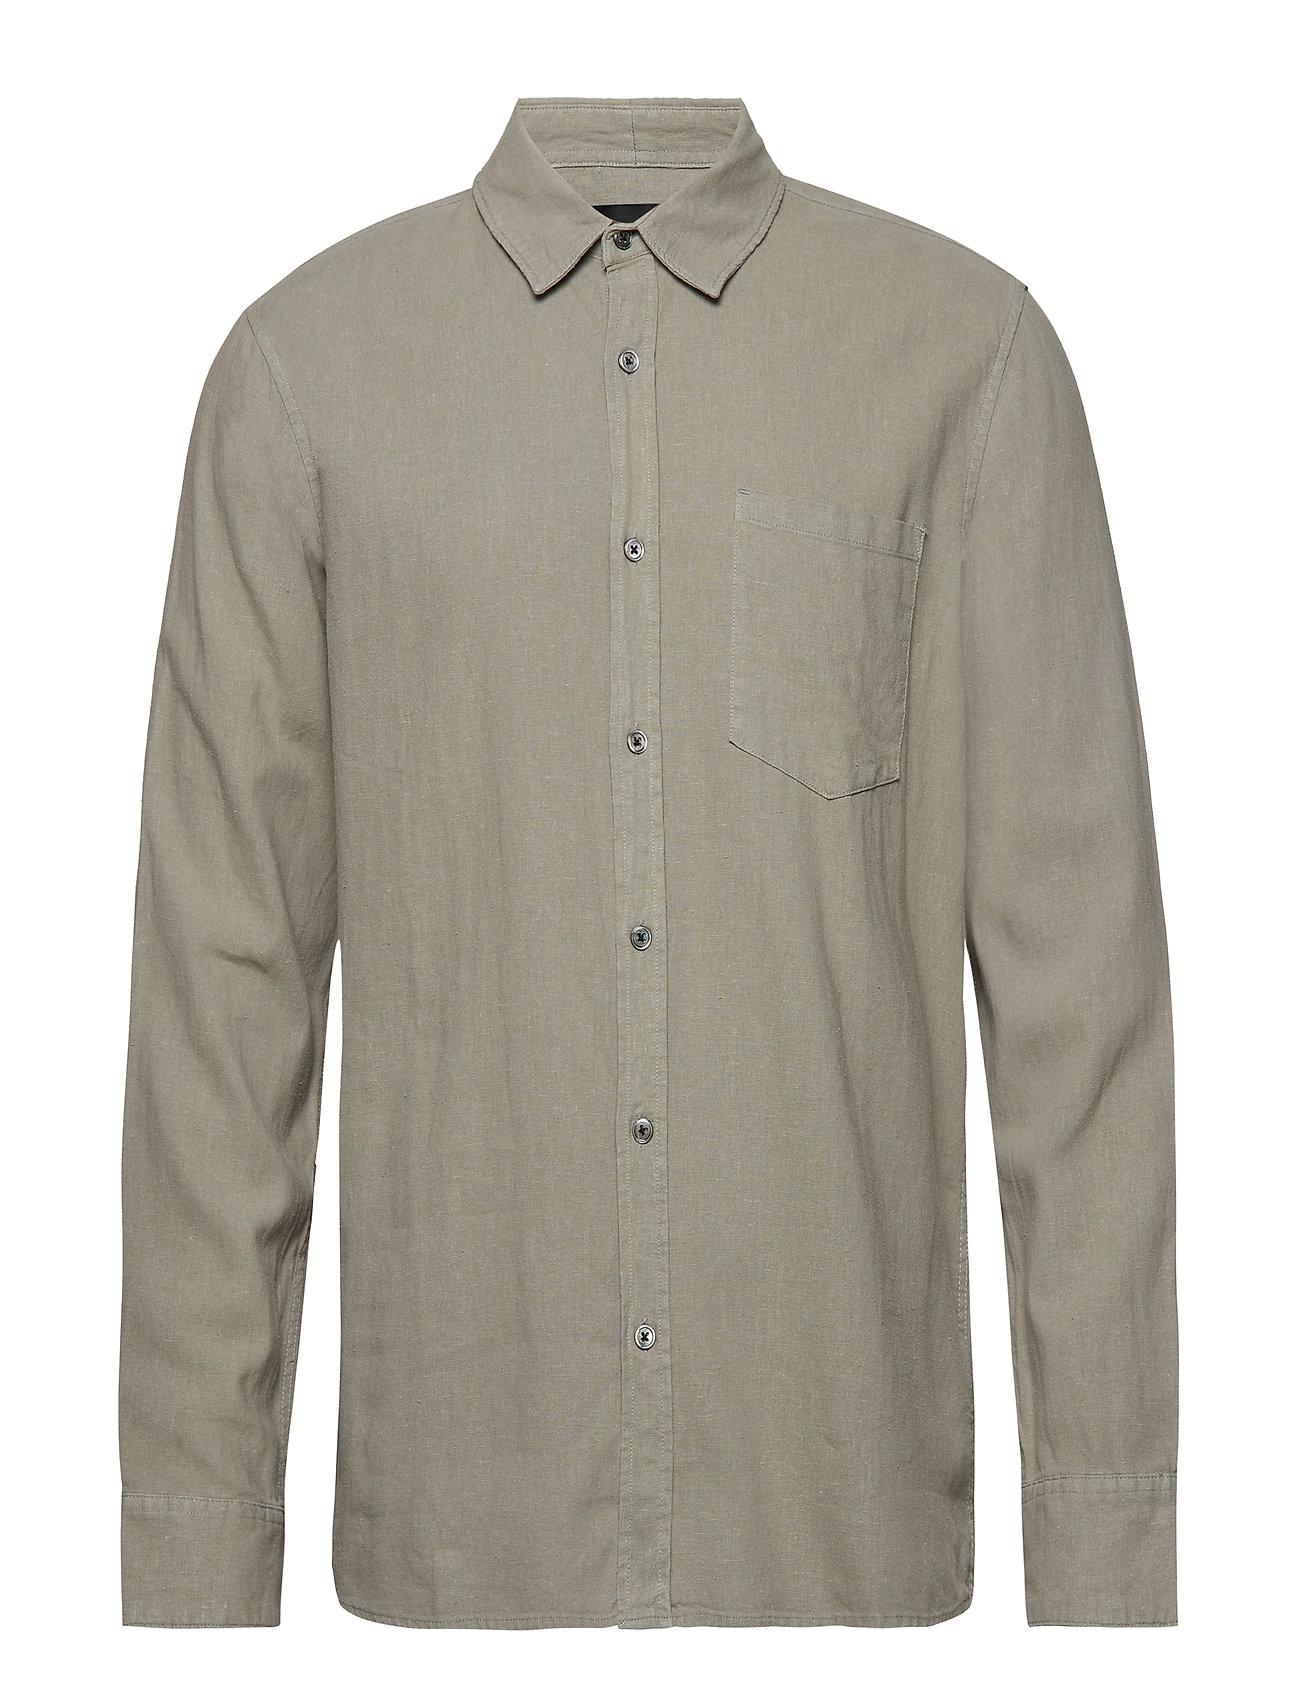 NEUW Waits Shirt - SAGE